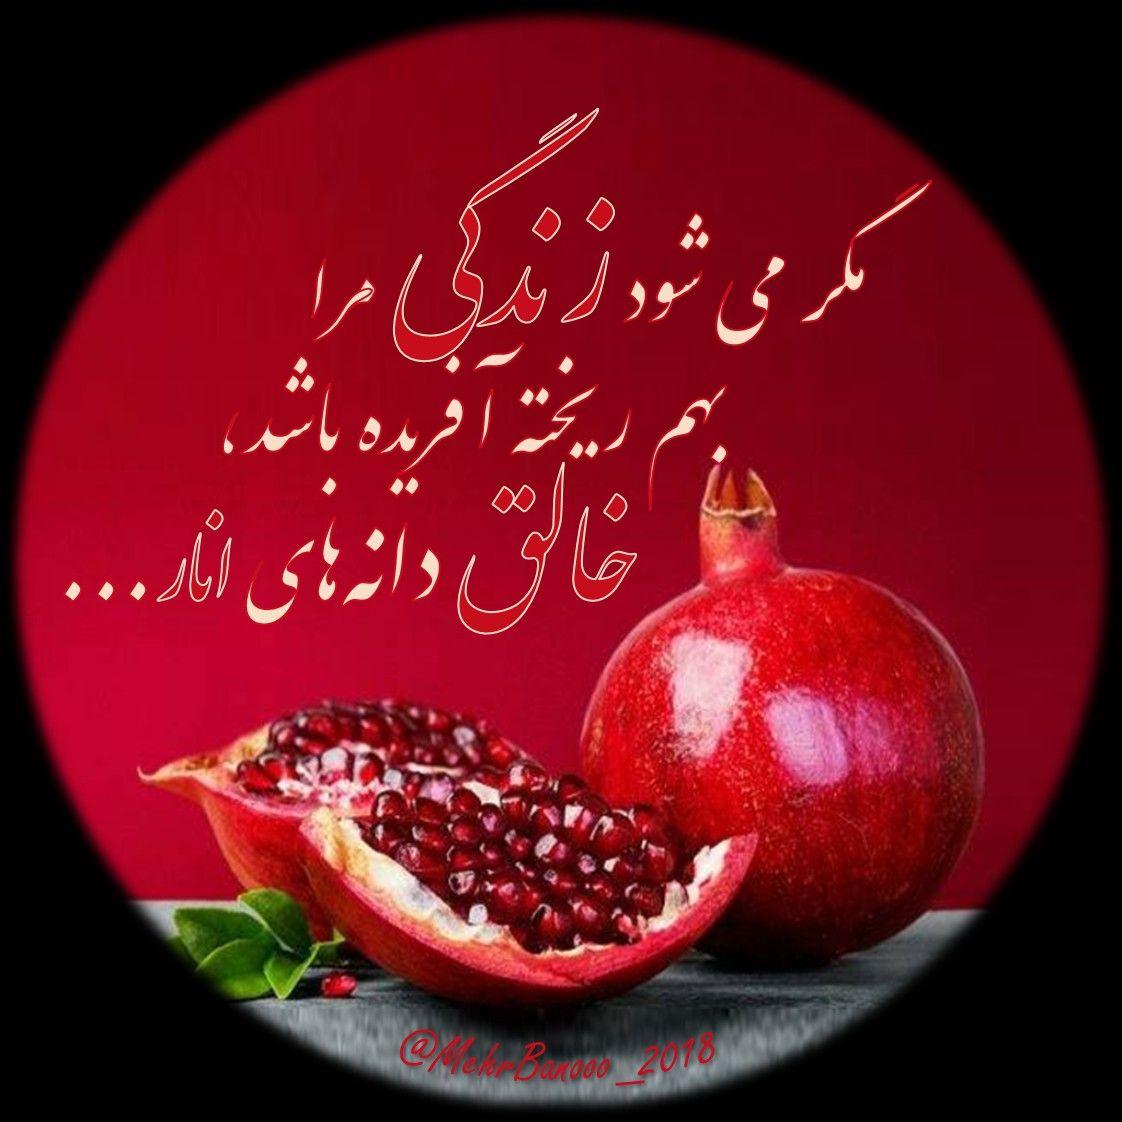 عکس نوشته عکس پروفایل کانال مهر بانو ۲۰۱۸ Mehrbanooo 2018 Persian Poetry Persian Poem Food